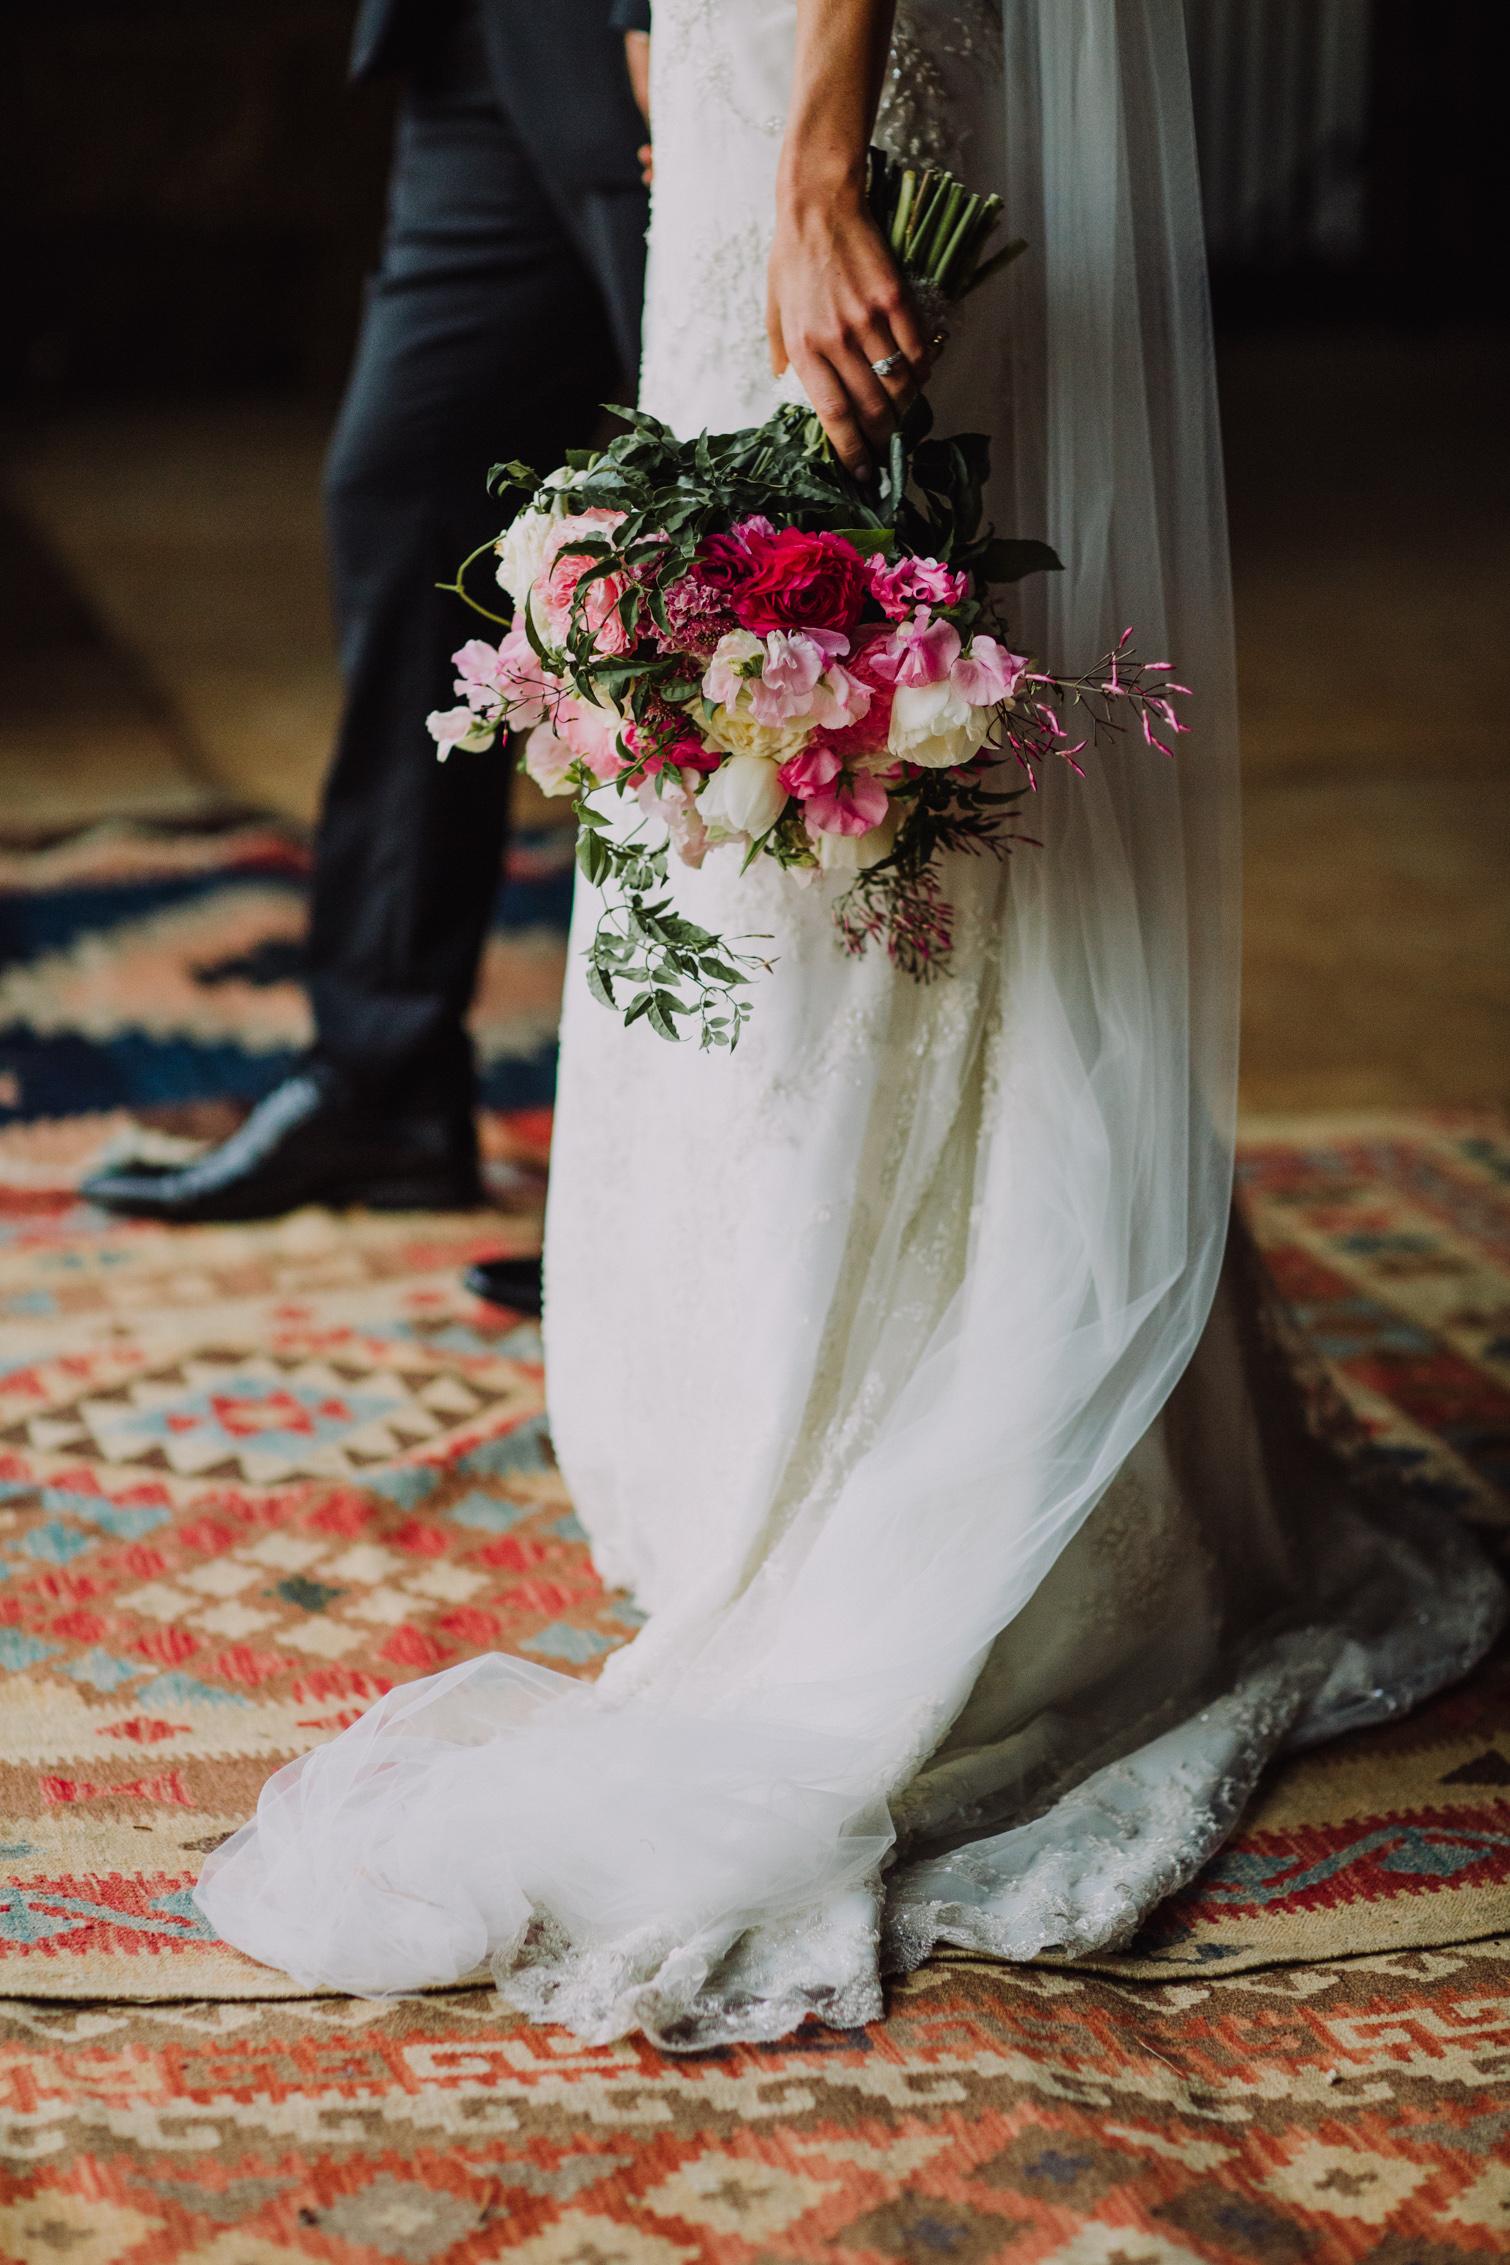 The_French_Petal_Wedding-Florist-12.jpg